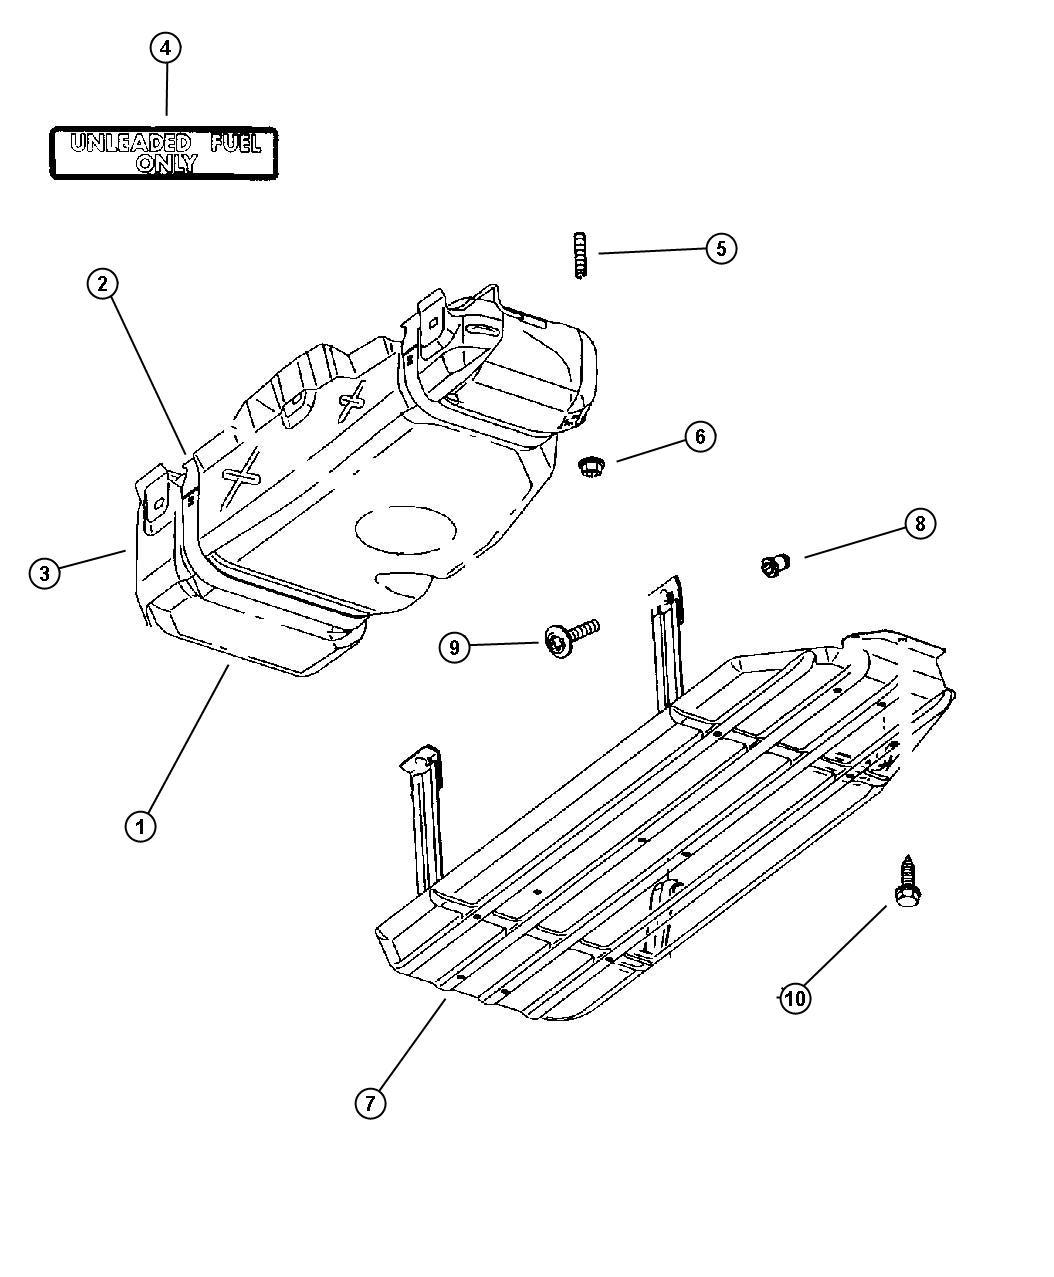 1999 dodge durango 5 9 Motor diagram